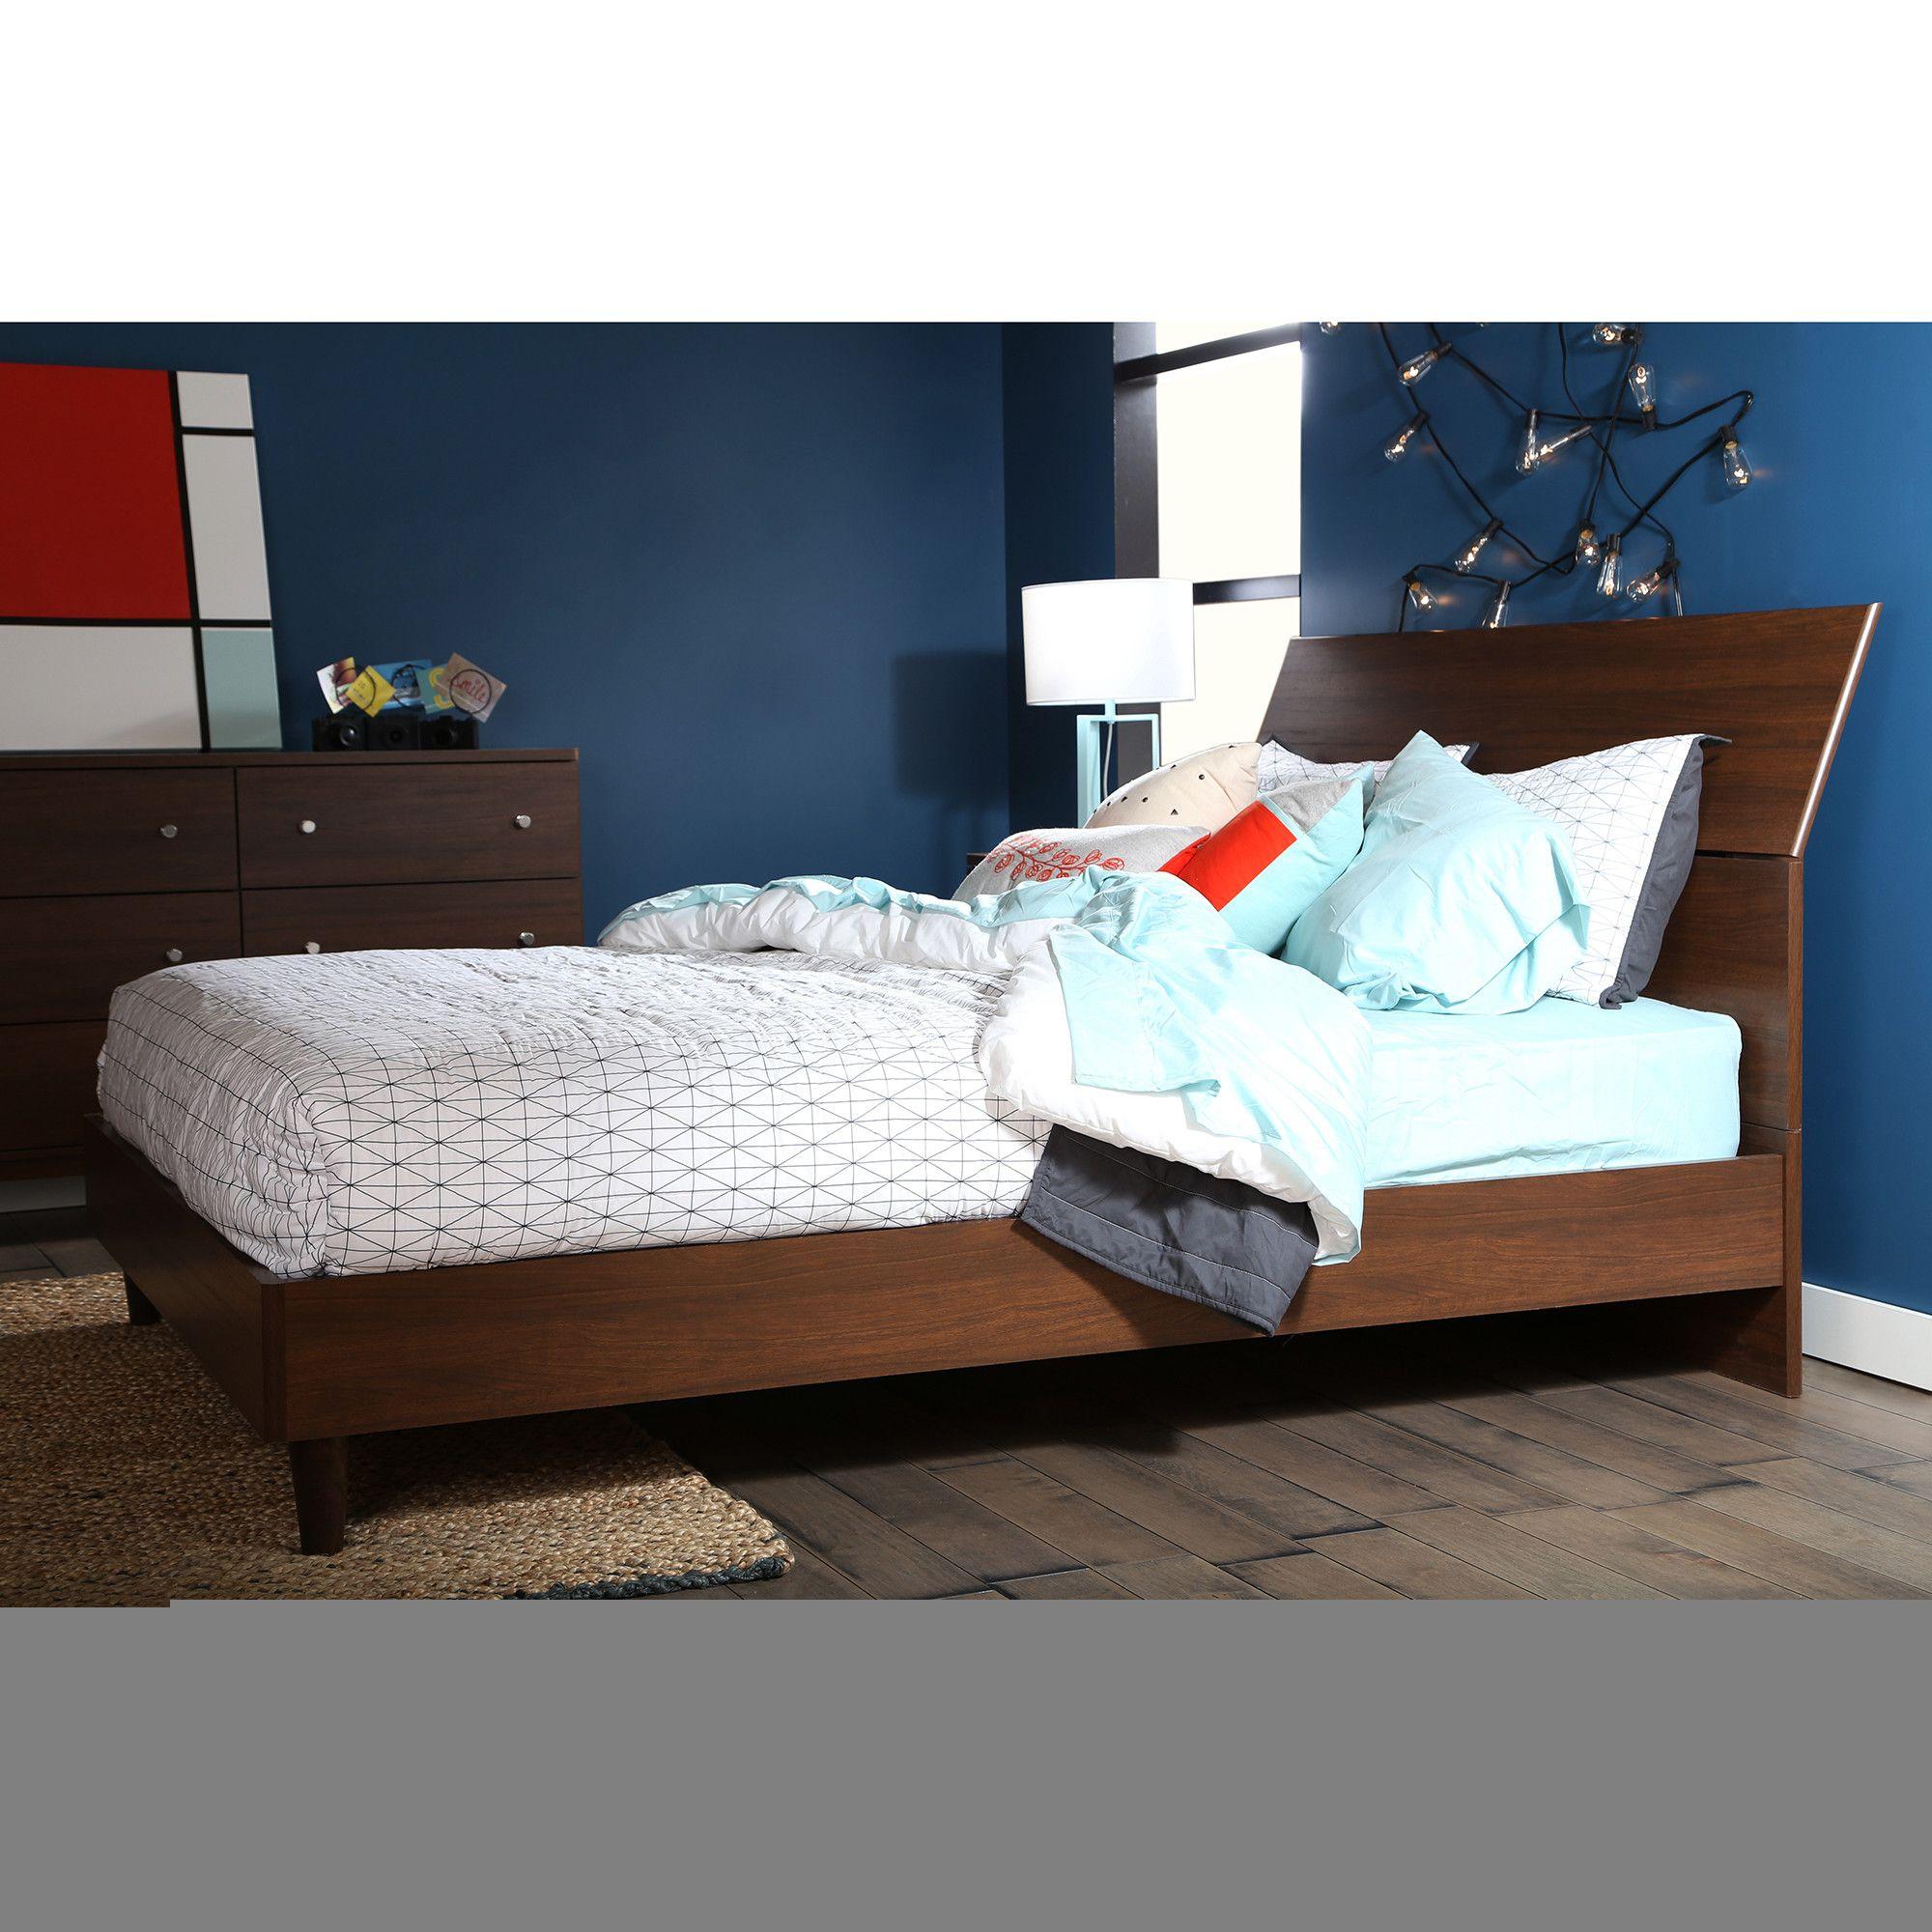 Fenton modern dark brown queen platform bed free shipping today - Olly Queen Platform Bed